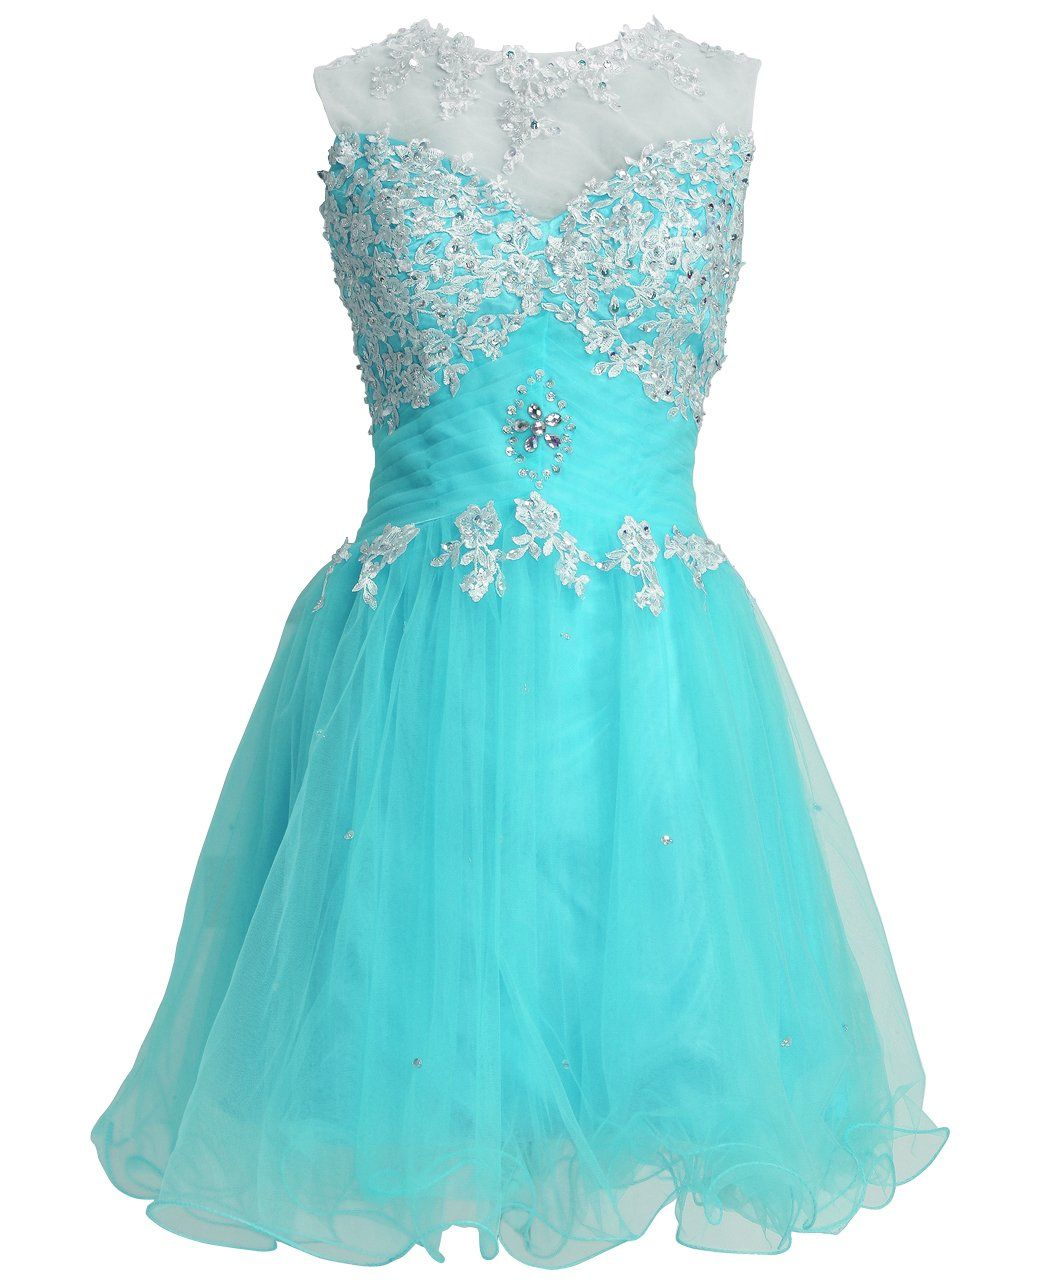 Fashion Plaza Mini Princess Illusion Neck Cutout Back Party Dress ...